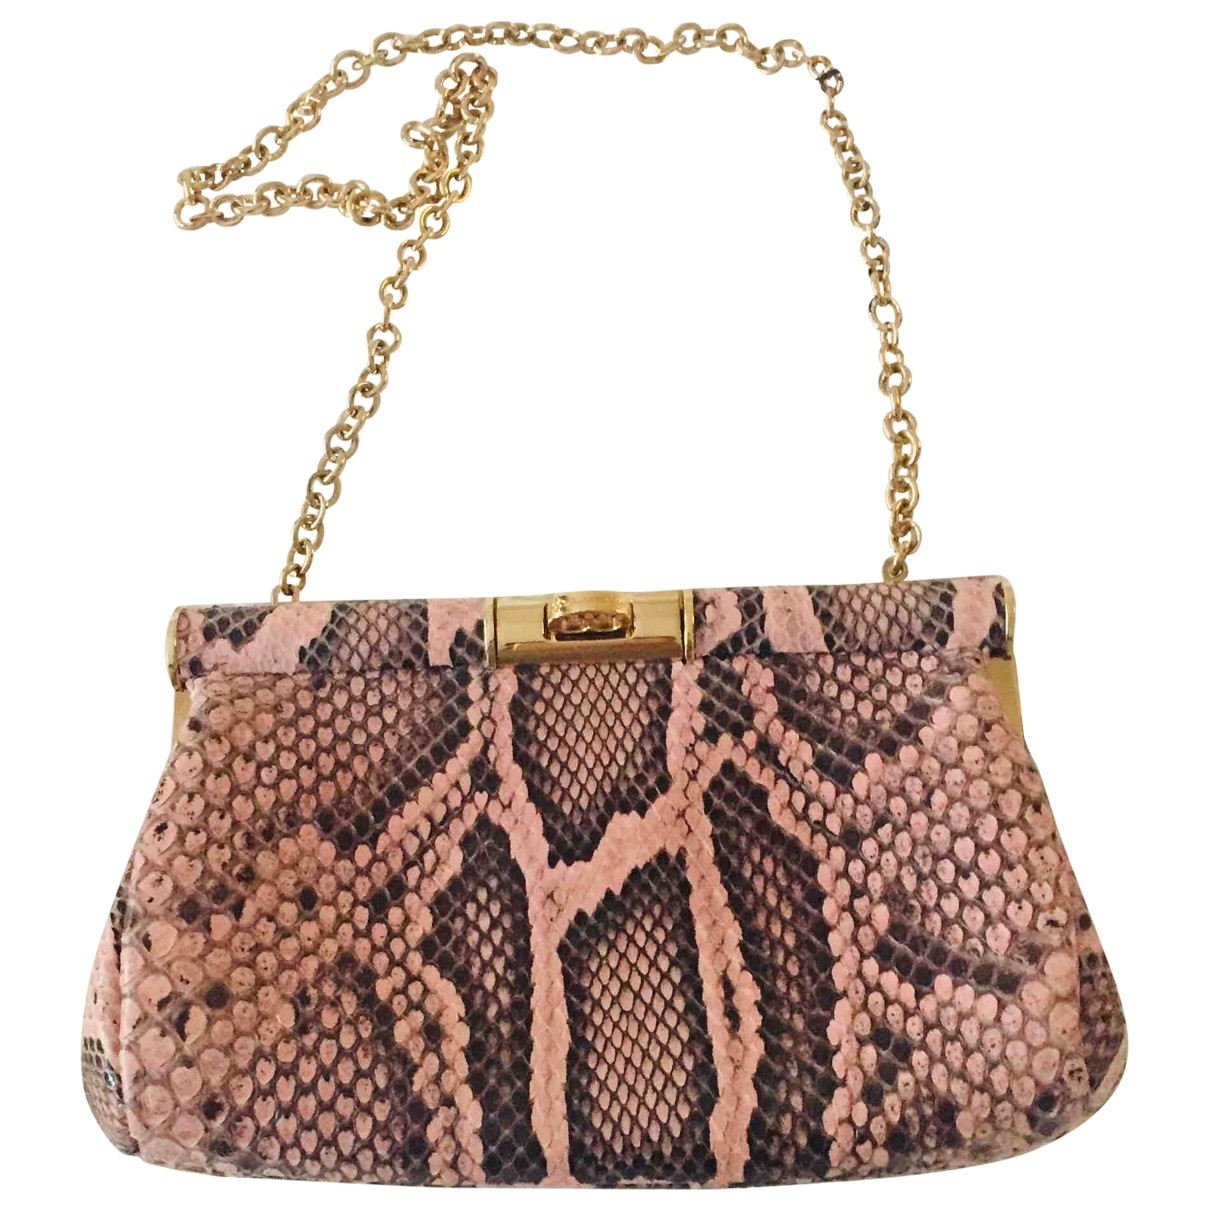 Dolce & Gabbana \N Pink Python Clutch bag for Women \N